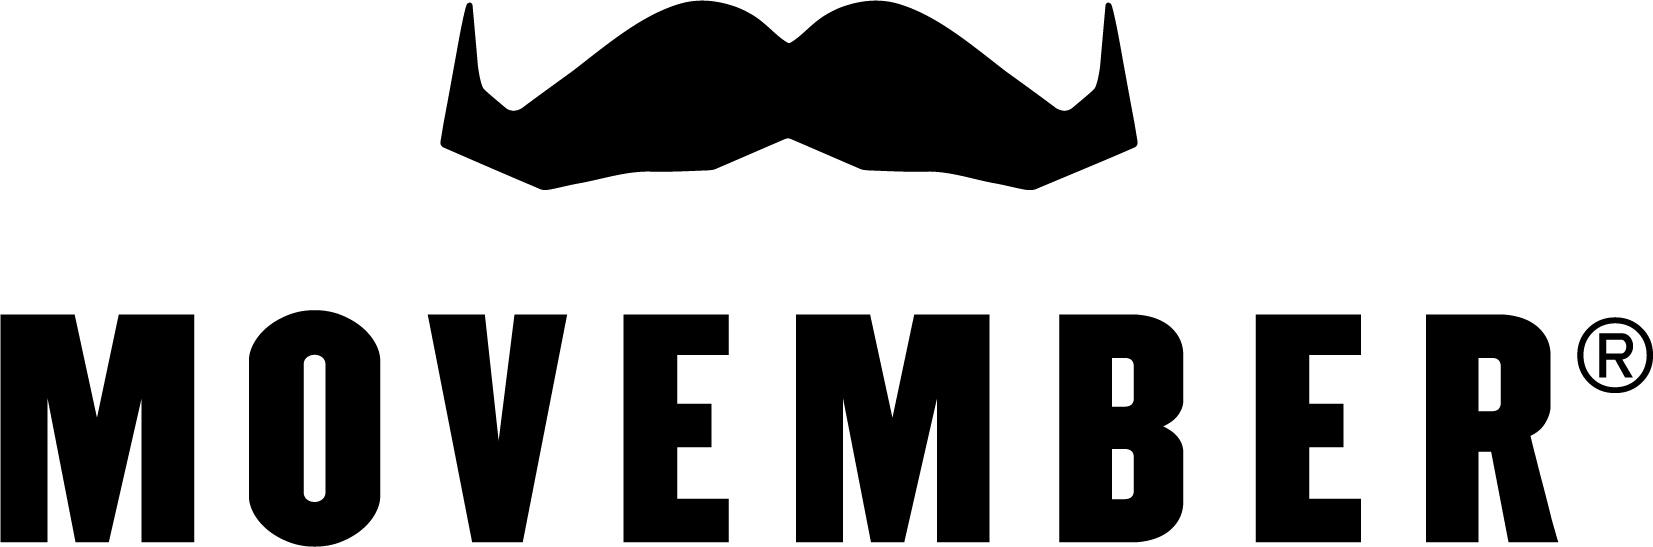 It/'s That Movember Feeling